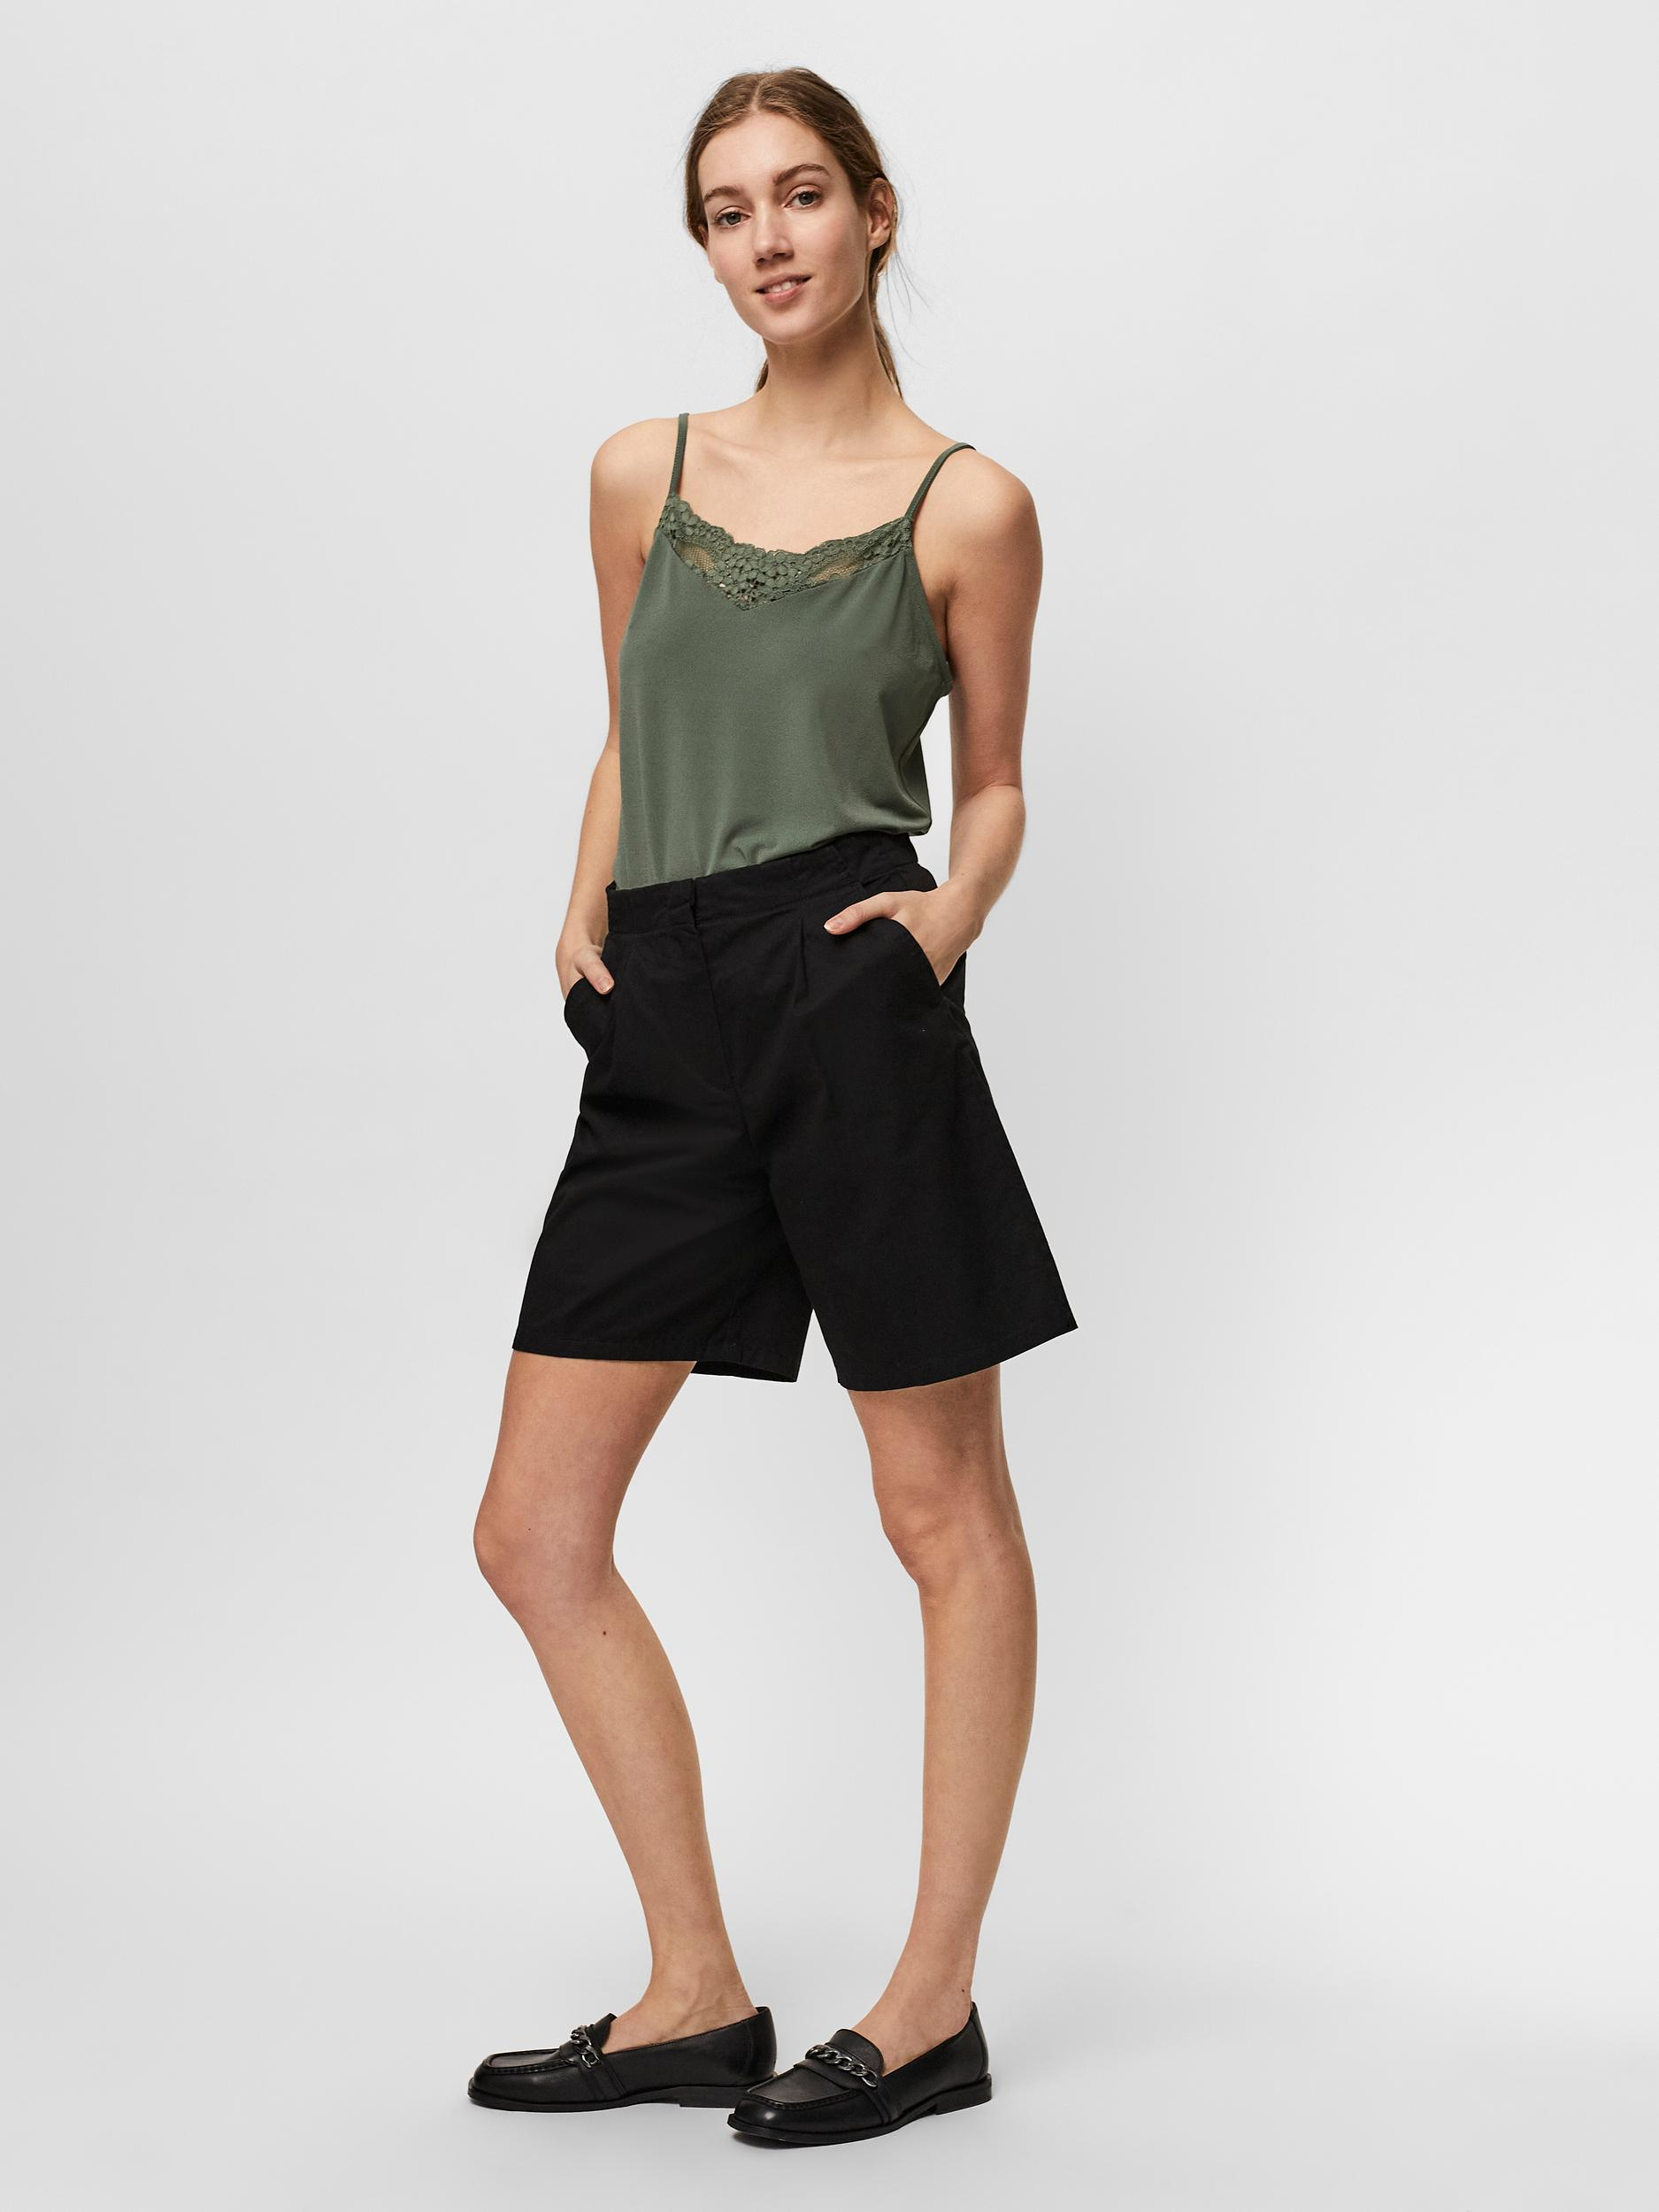 Vero Moda Charlie shorts, black, x-large